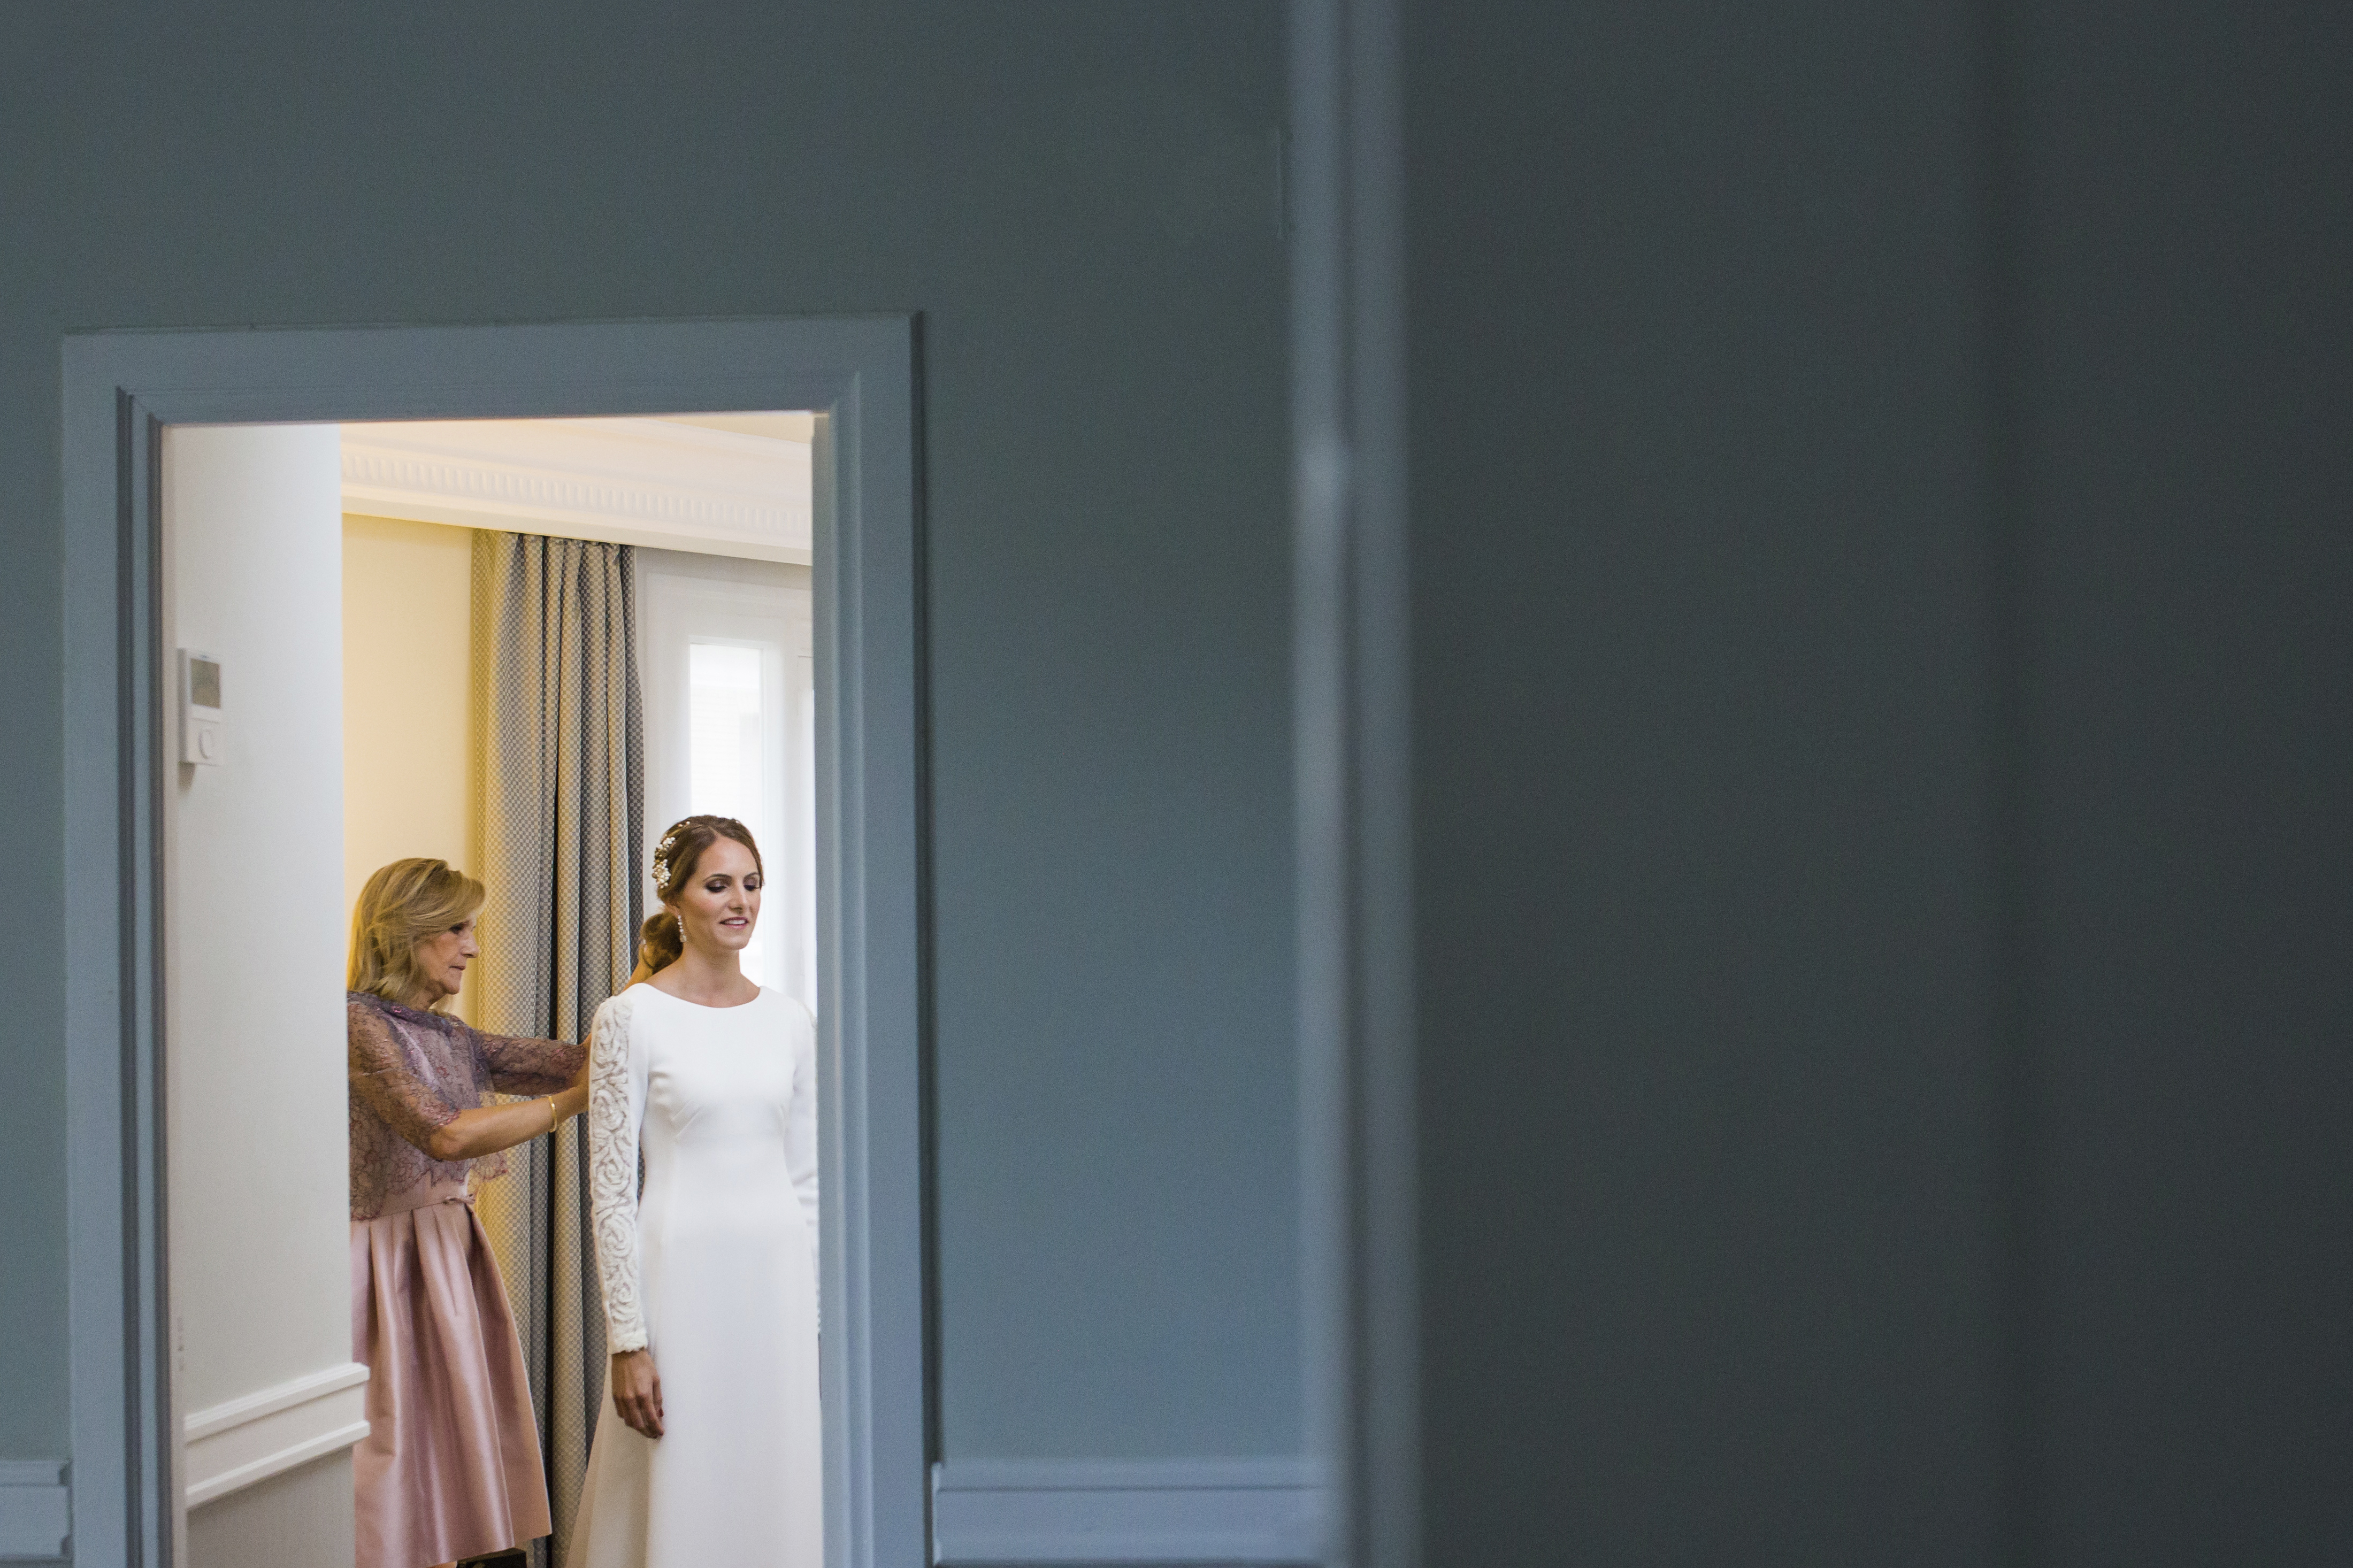 mandarina weddig, fotografos de boda, fotografo boda soria, fotografo boda barcelona, fotografo boda Madrid, fotografo boda lerida, fotografo boda Huesca_19